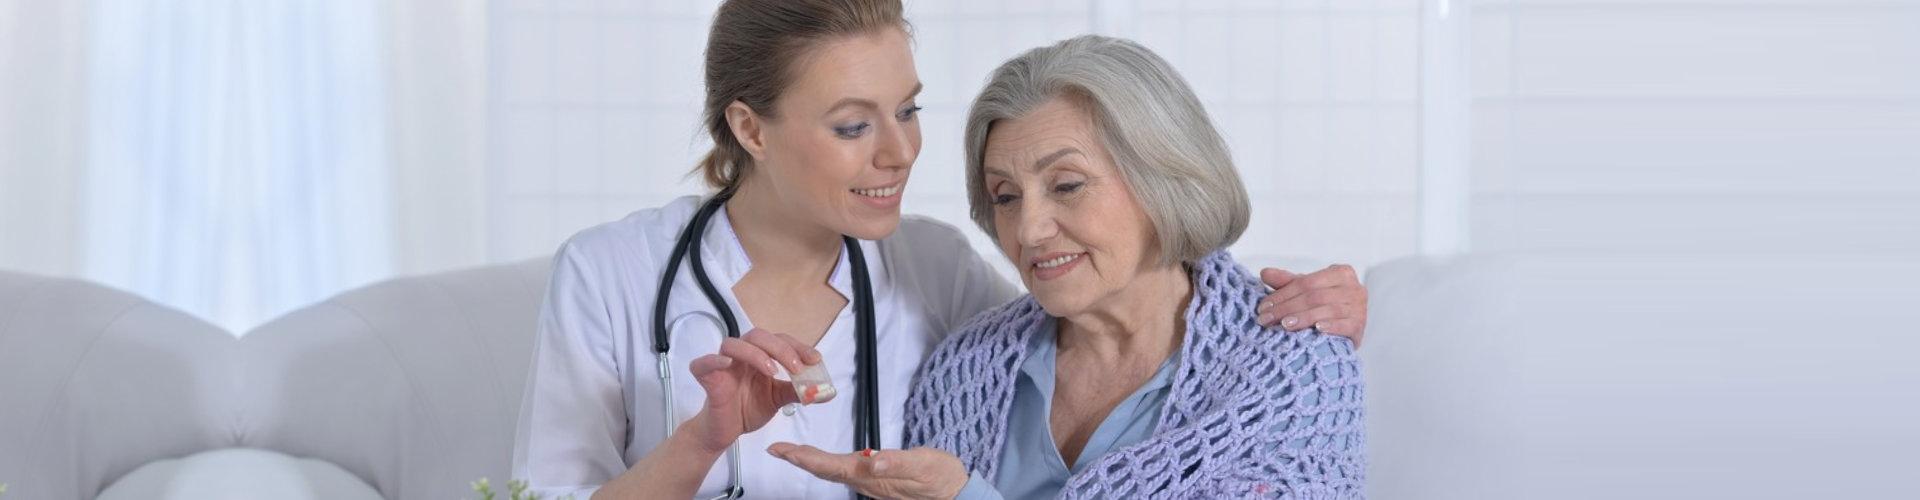 pharmacist giving patient medicine